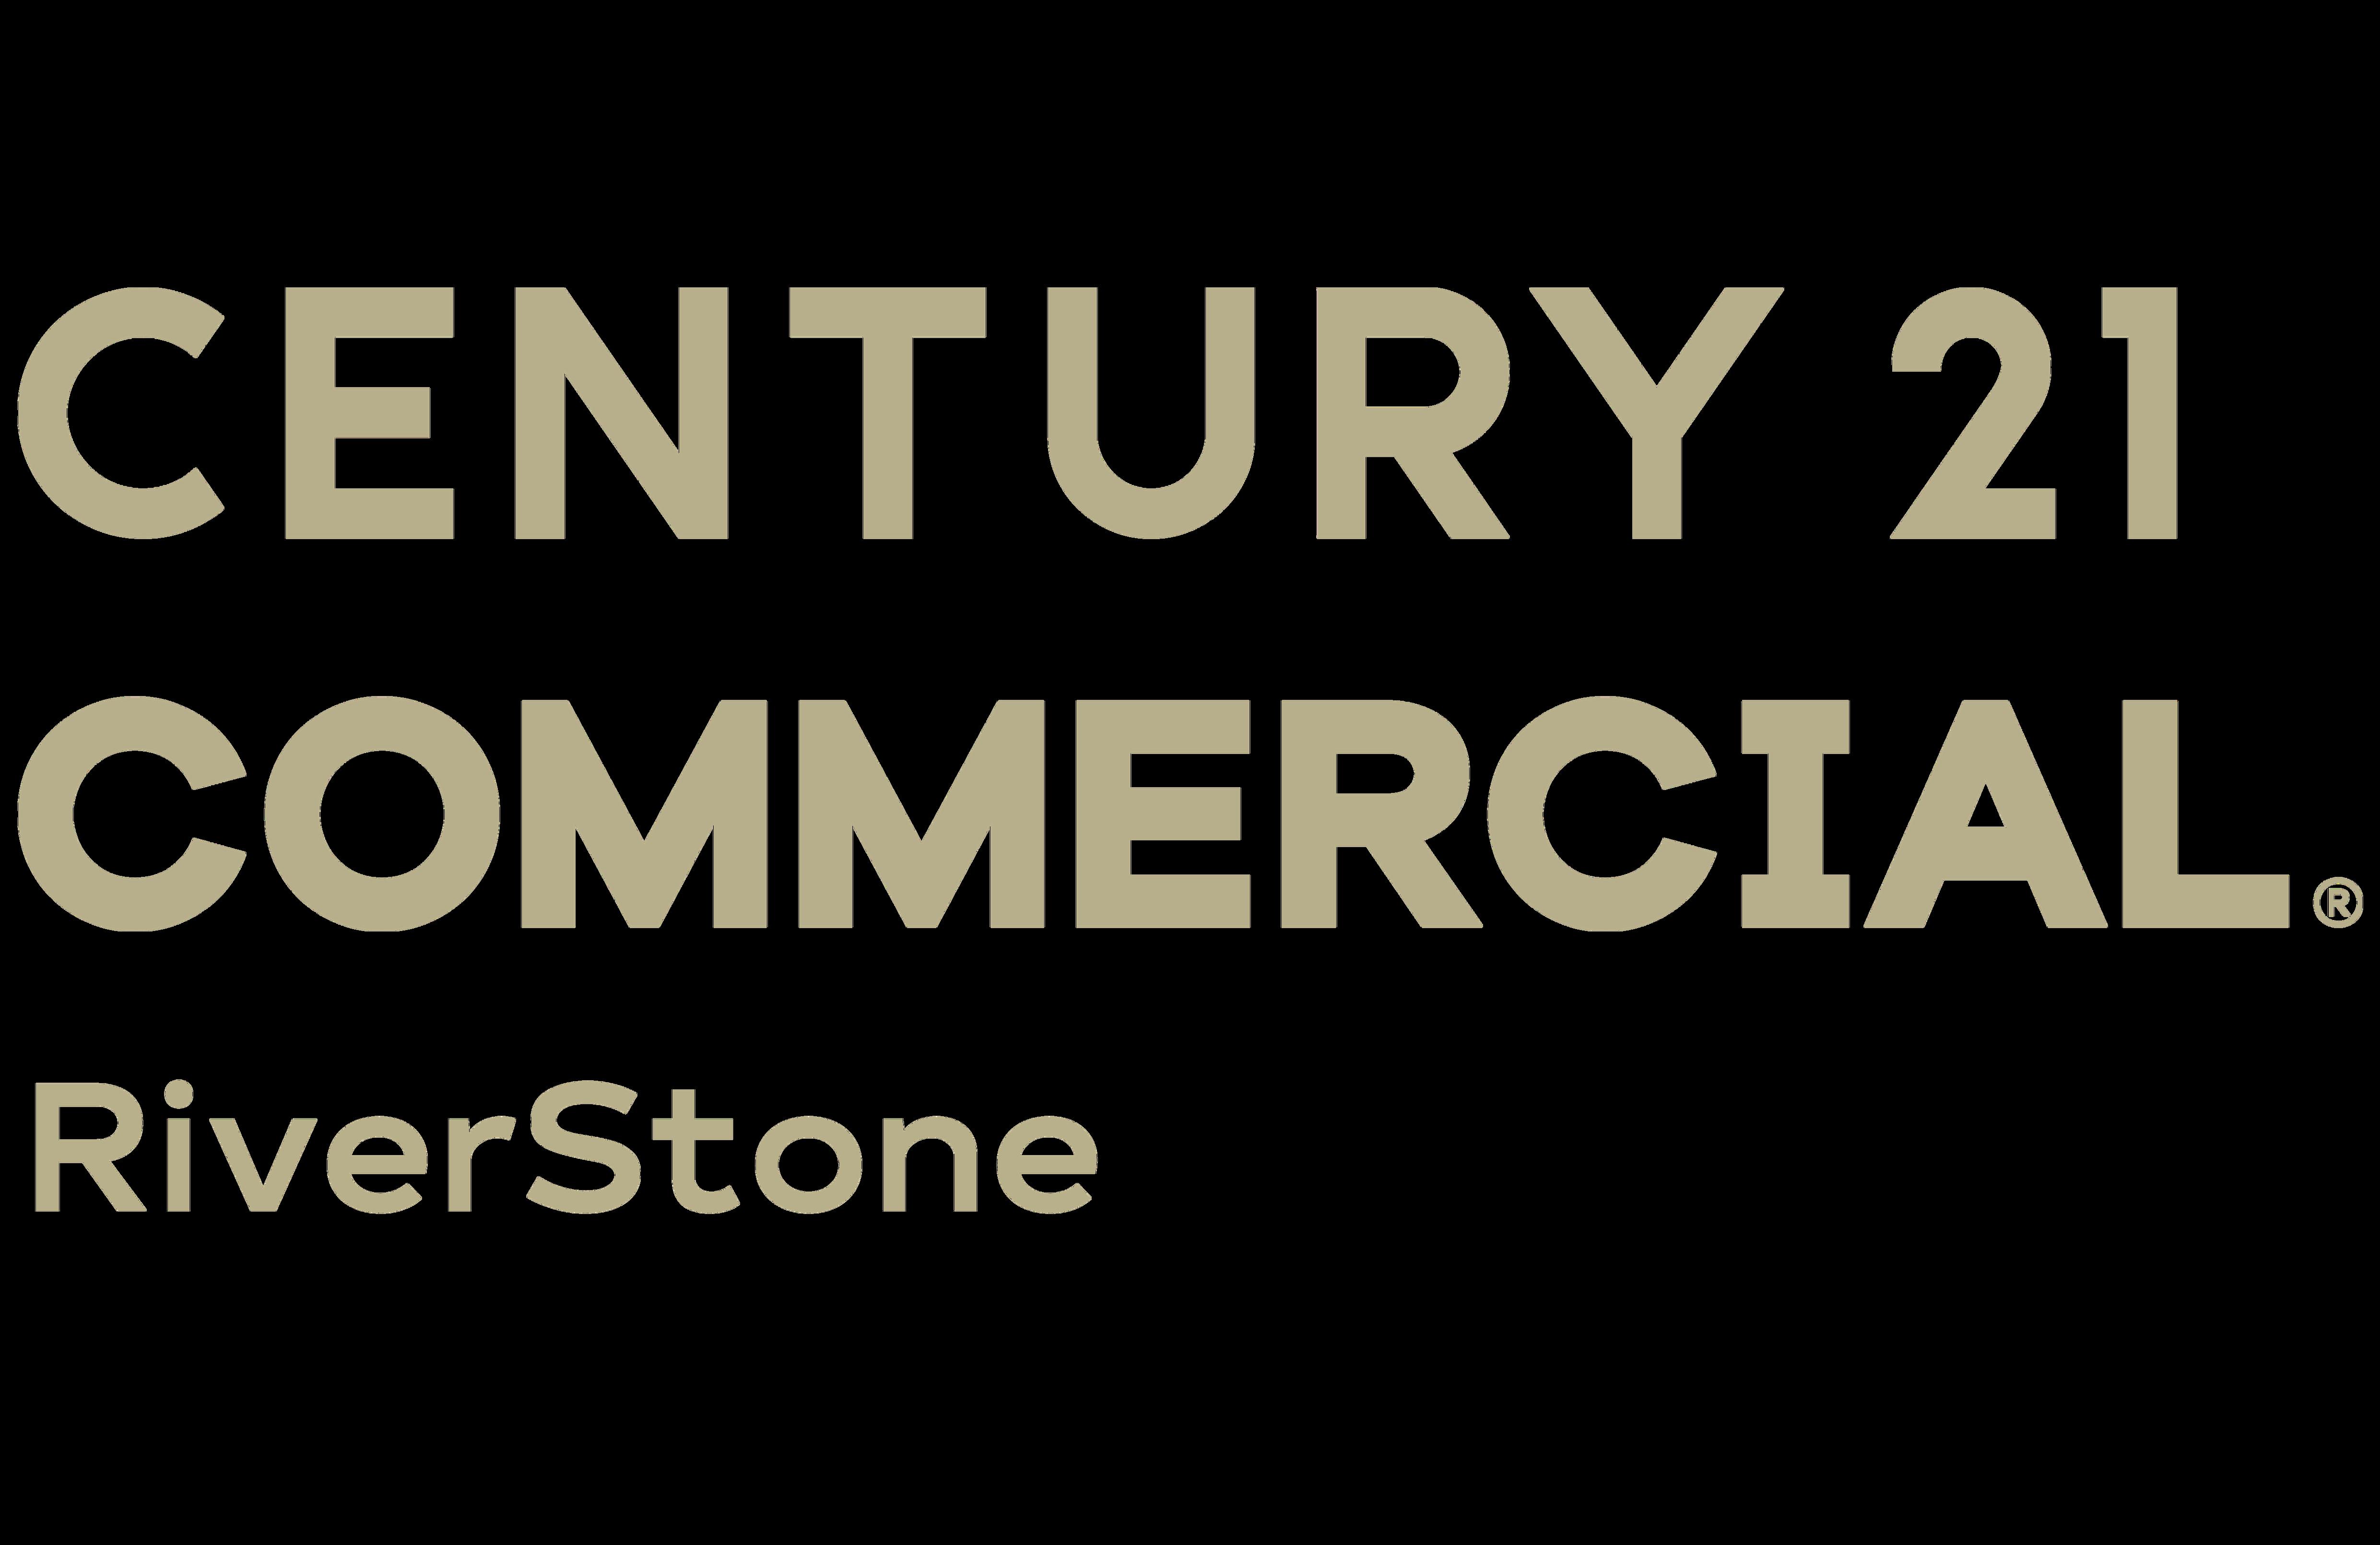 CENTURY 21 RiverStone